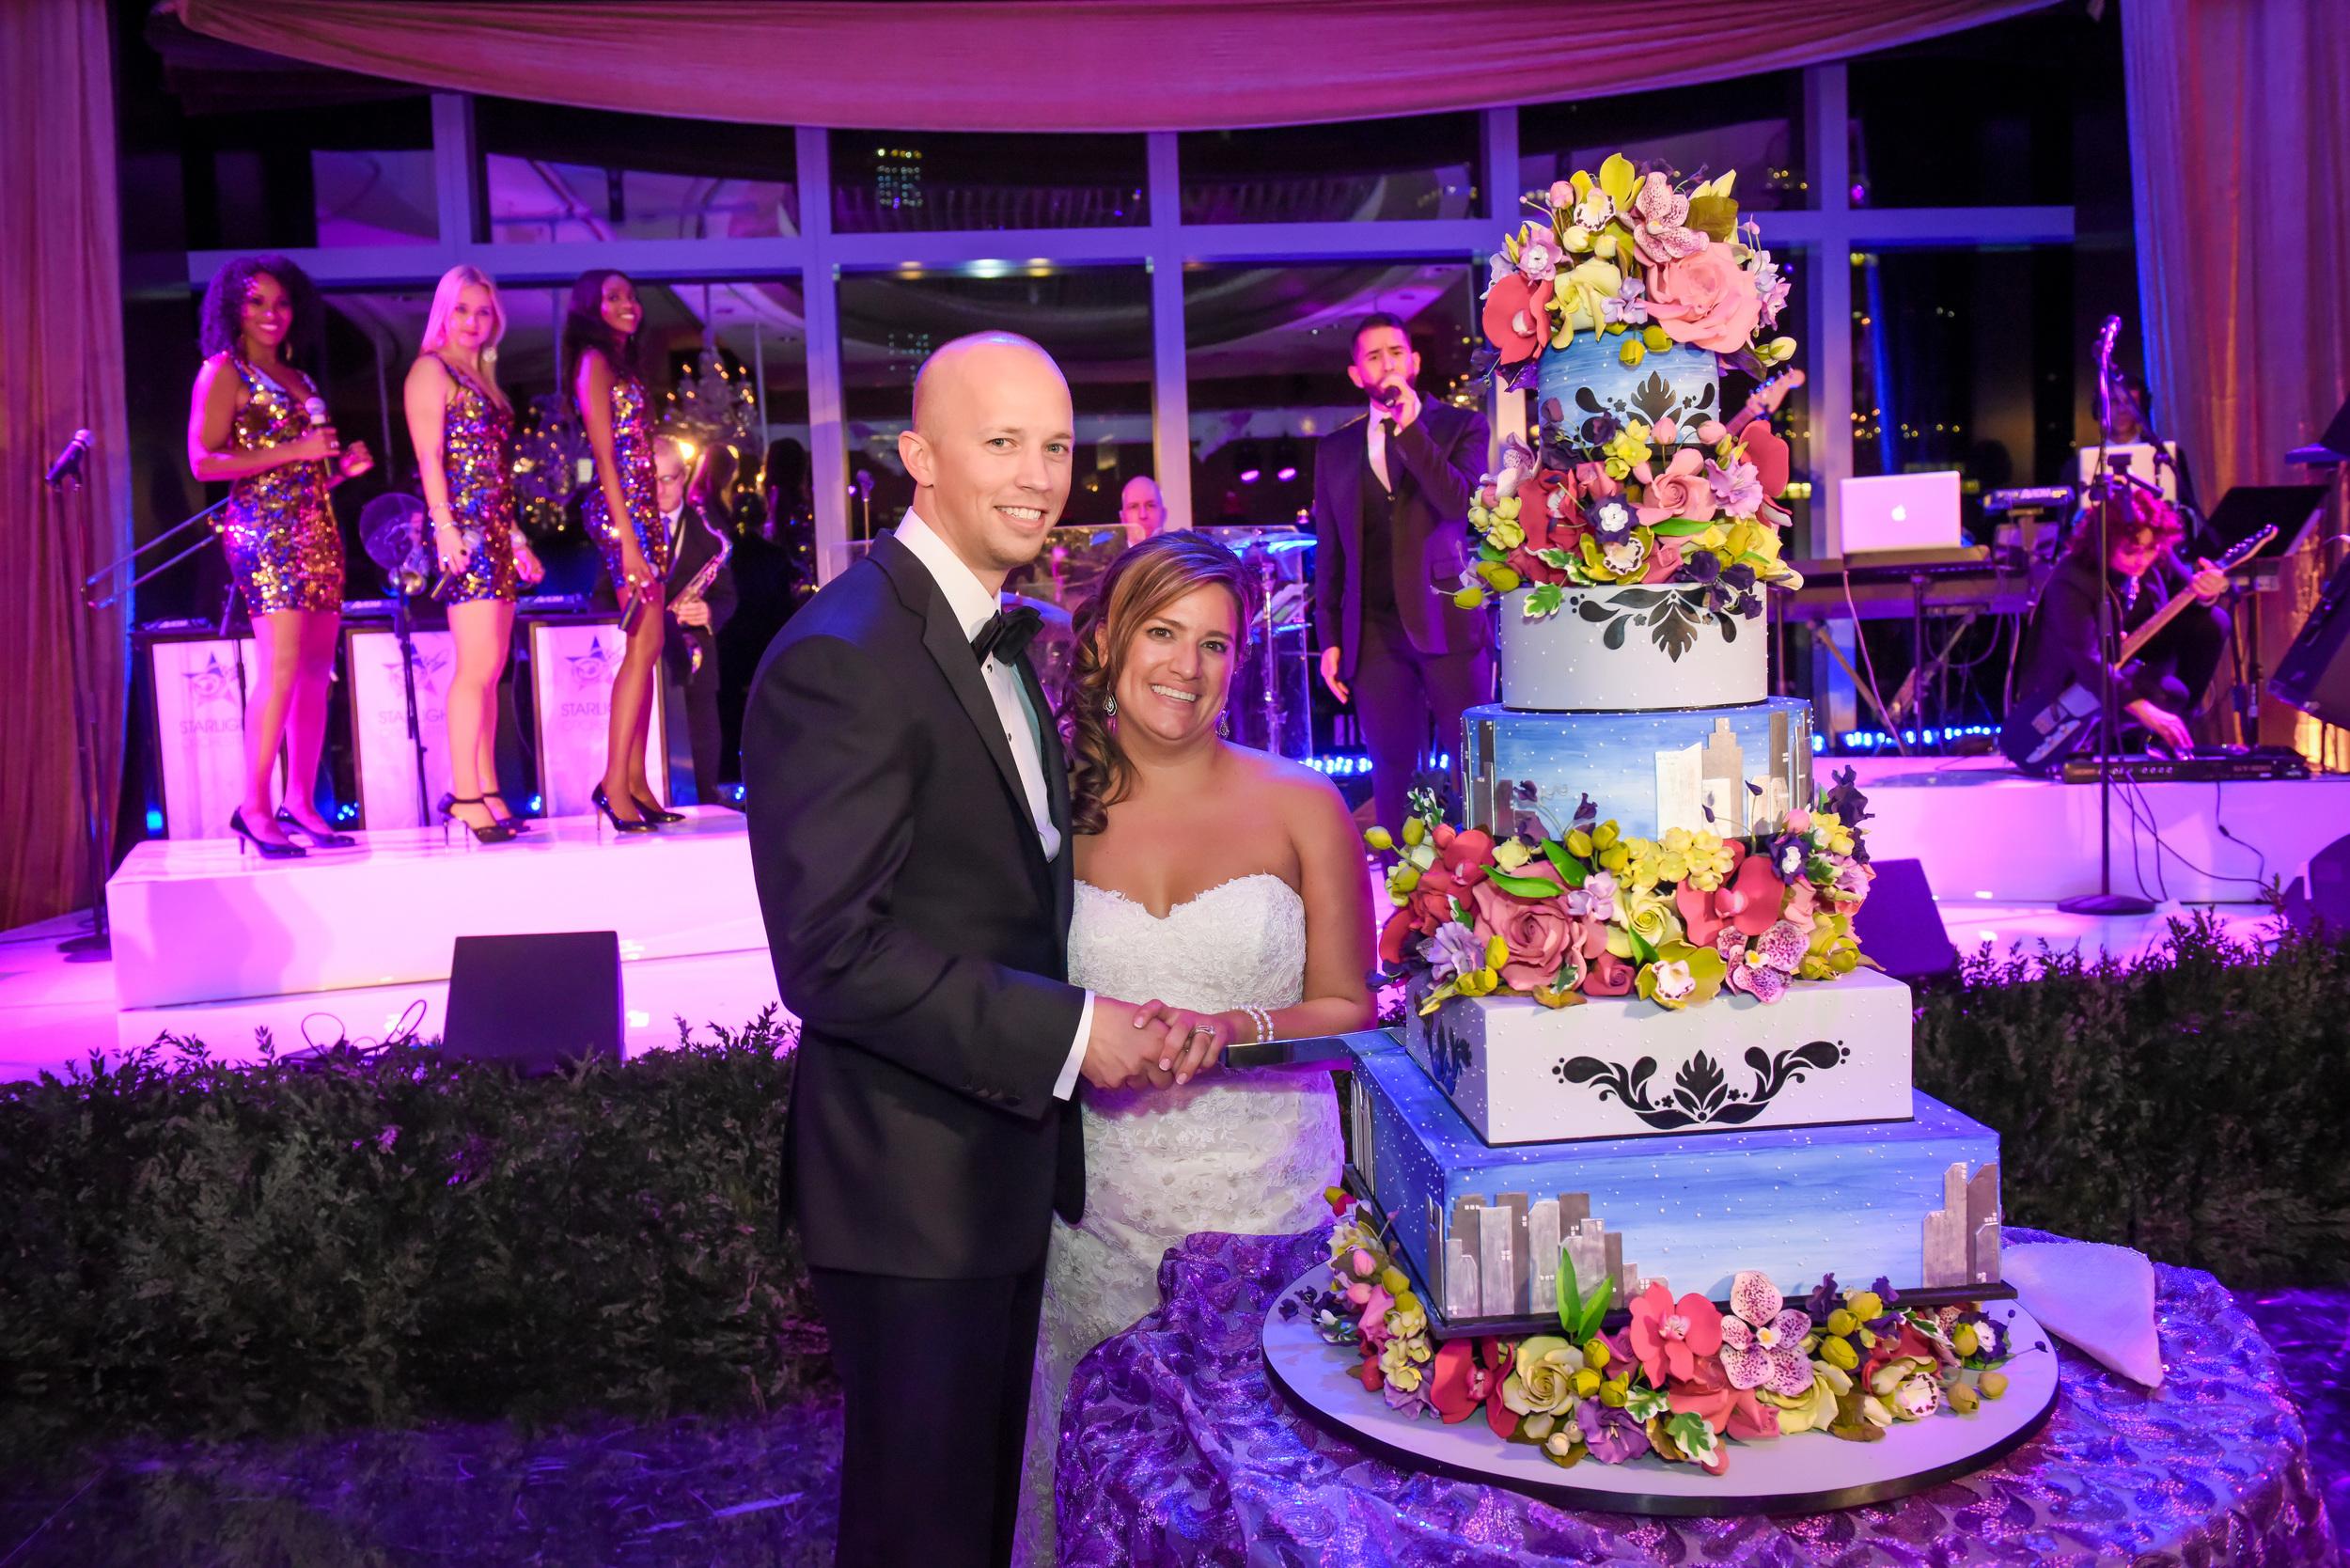 mandarin_oriental_new_york_city_branding_inspiration_lavender_silver_wedding_floral_purple_v284_38.jpg